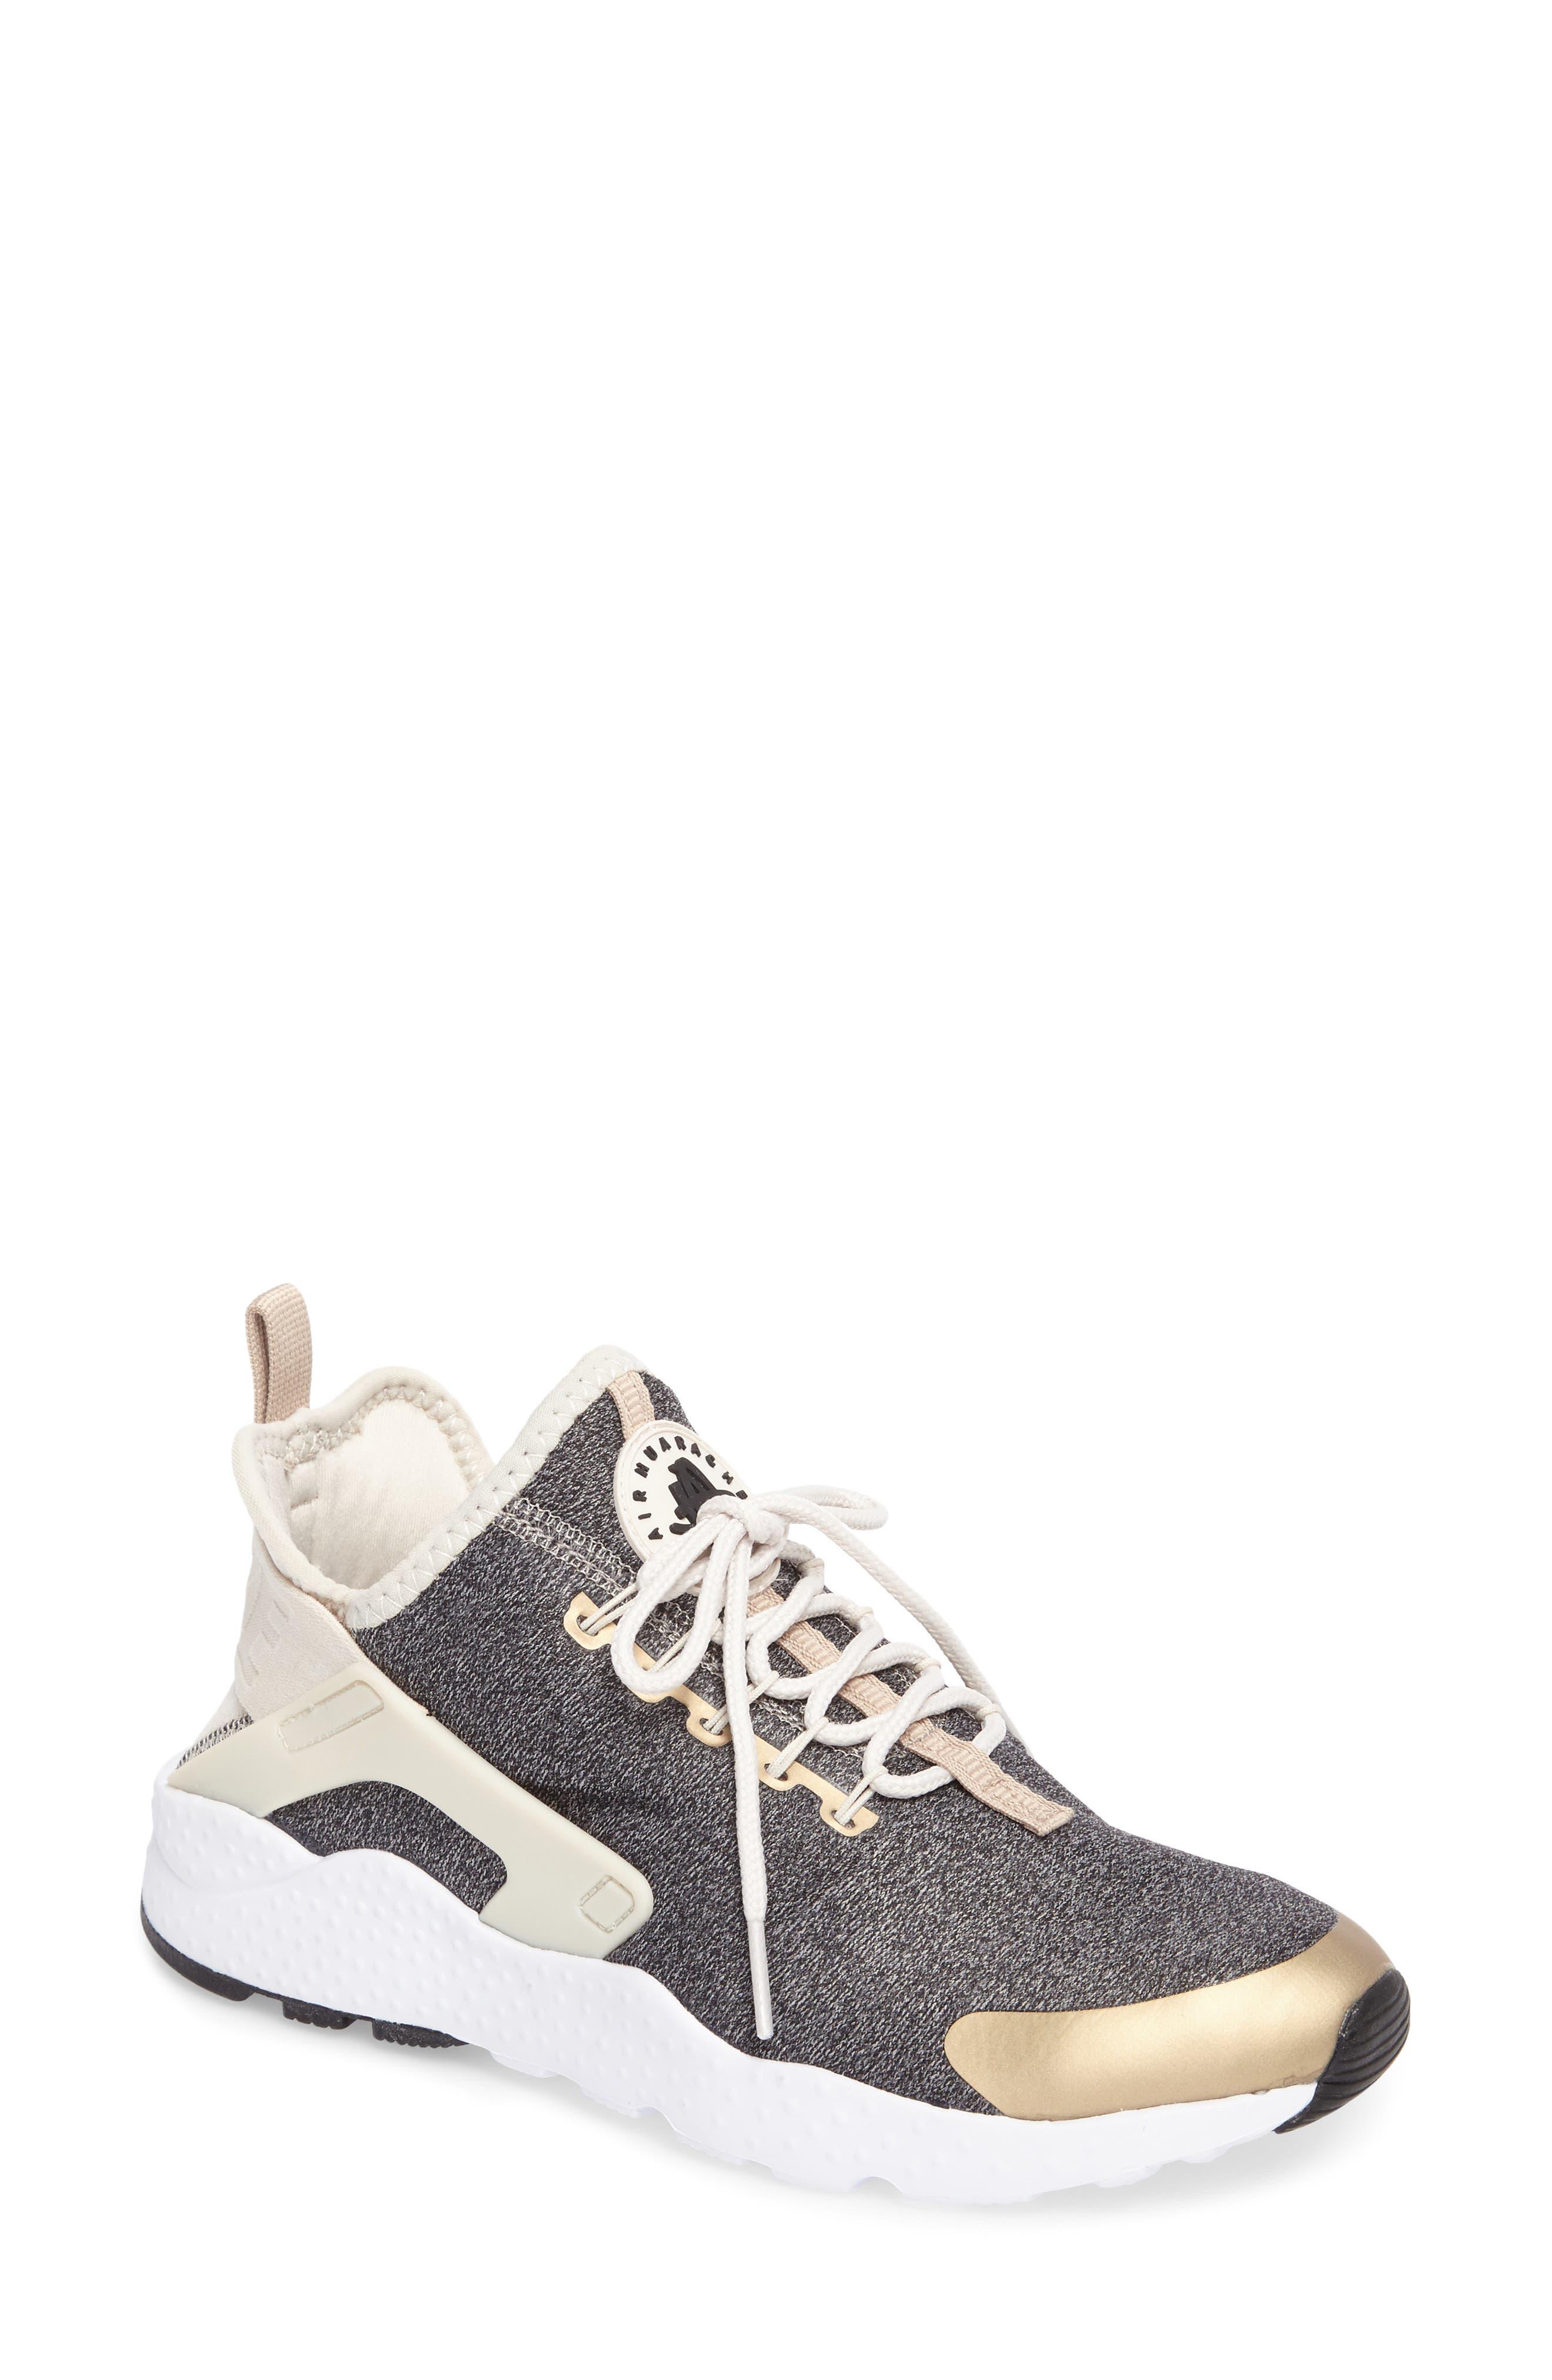 NIKE,                             'Air Huarache Run Ultra SE' Sneaker,                             Main thumbnail 1, color,                             285